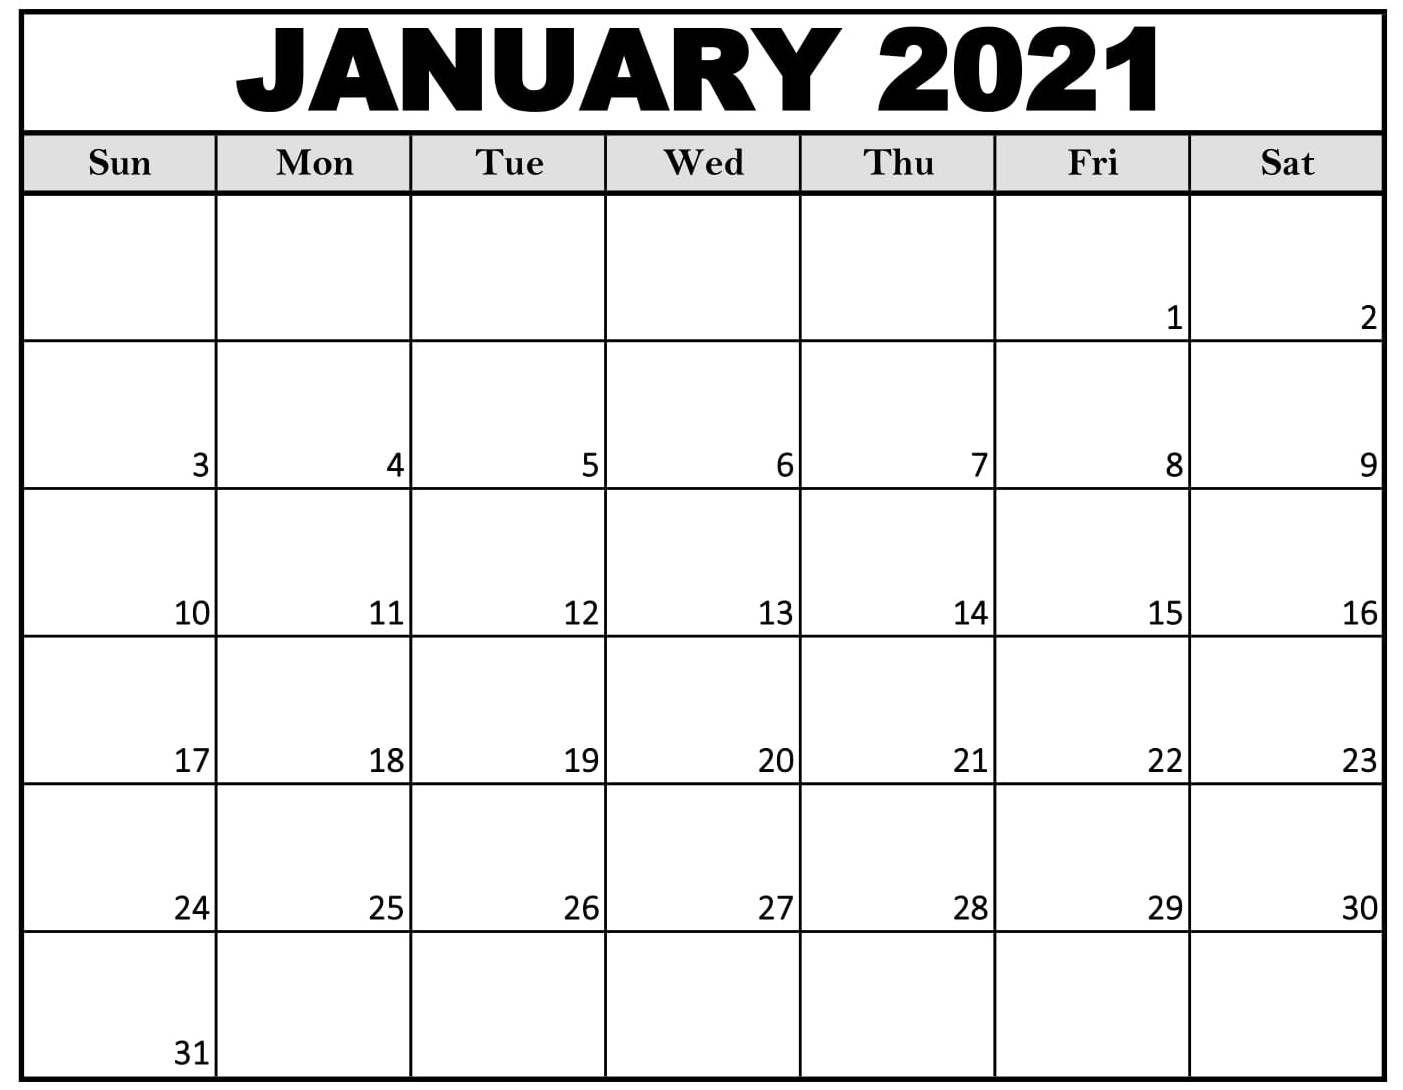 February 2021 Free Printable 2021 Calendar With Holidays